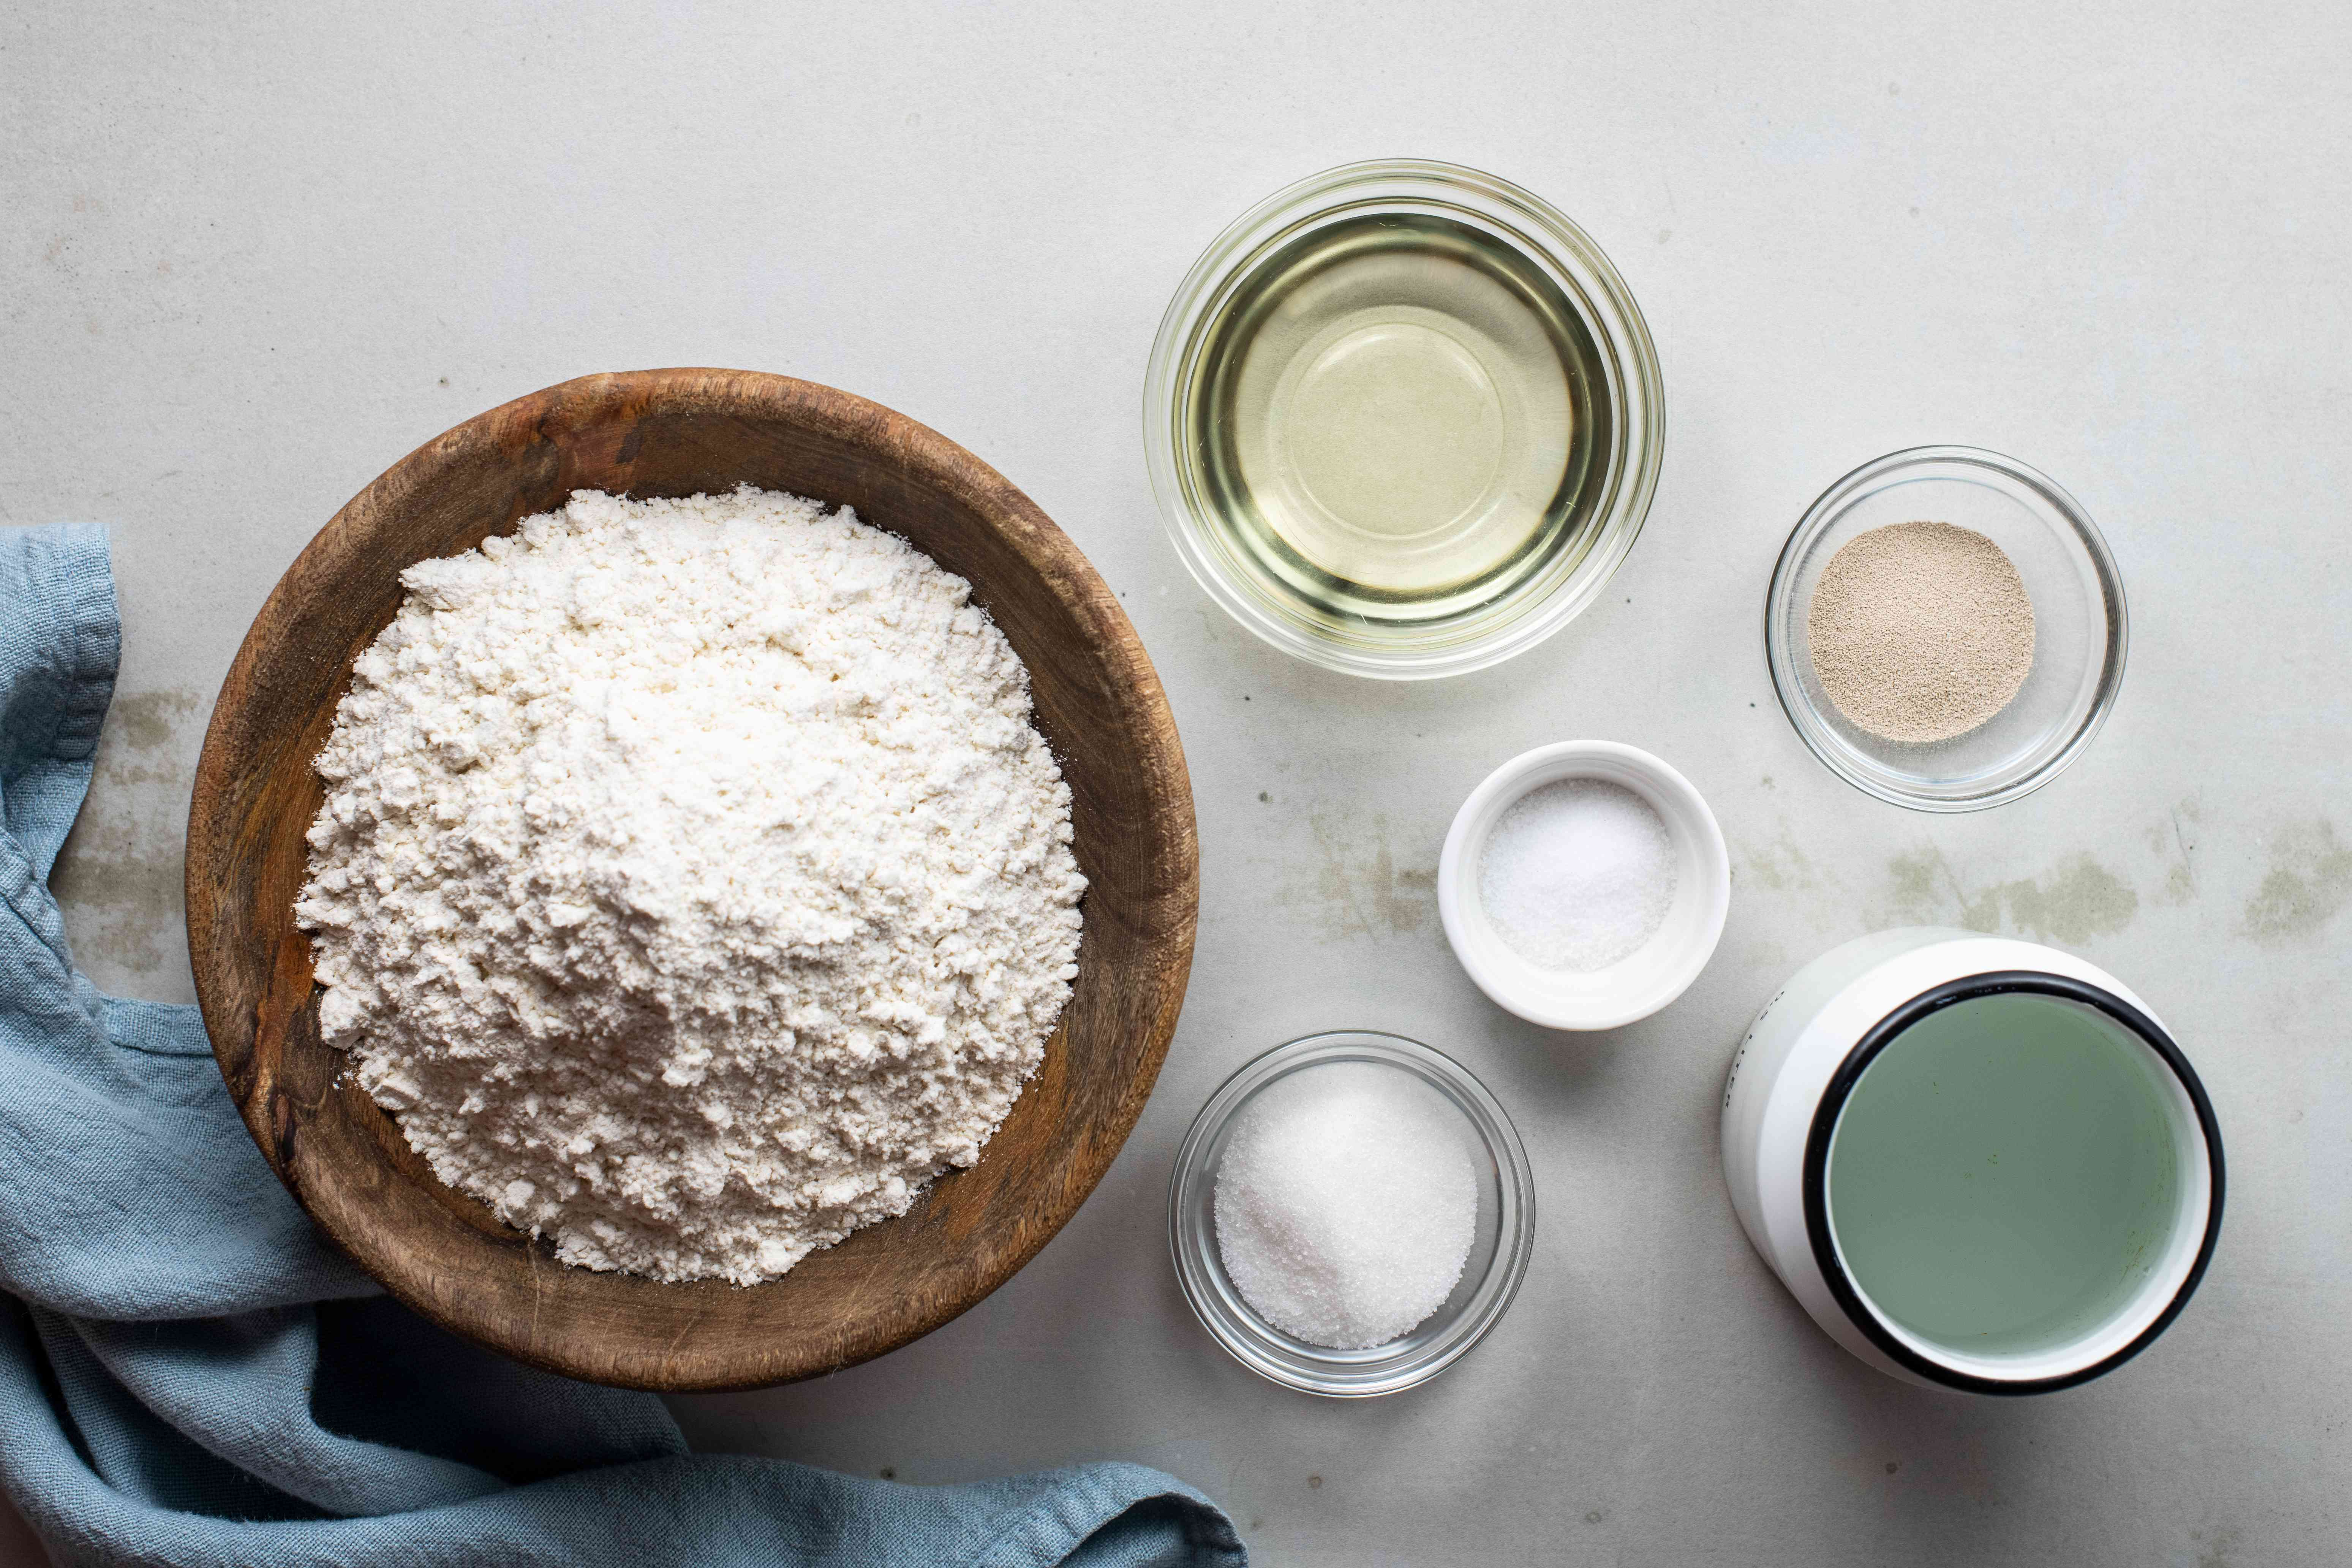 Ingredients for dough balls